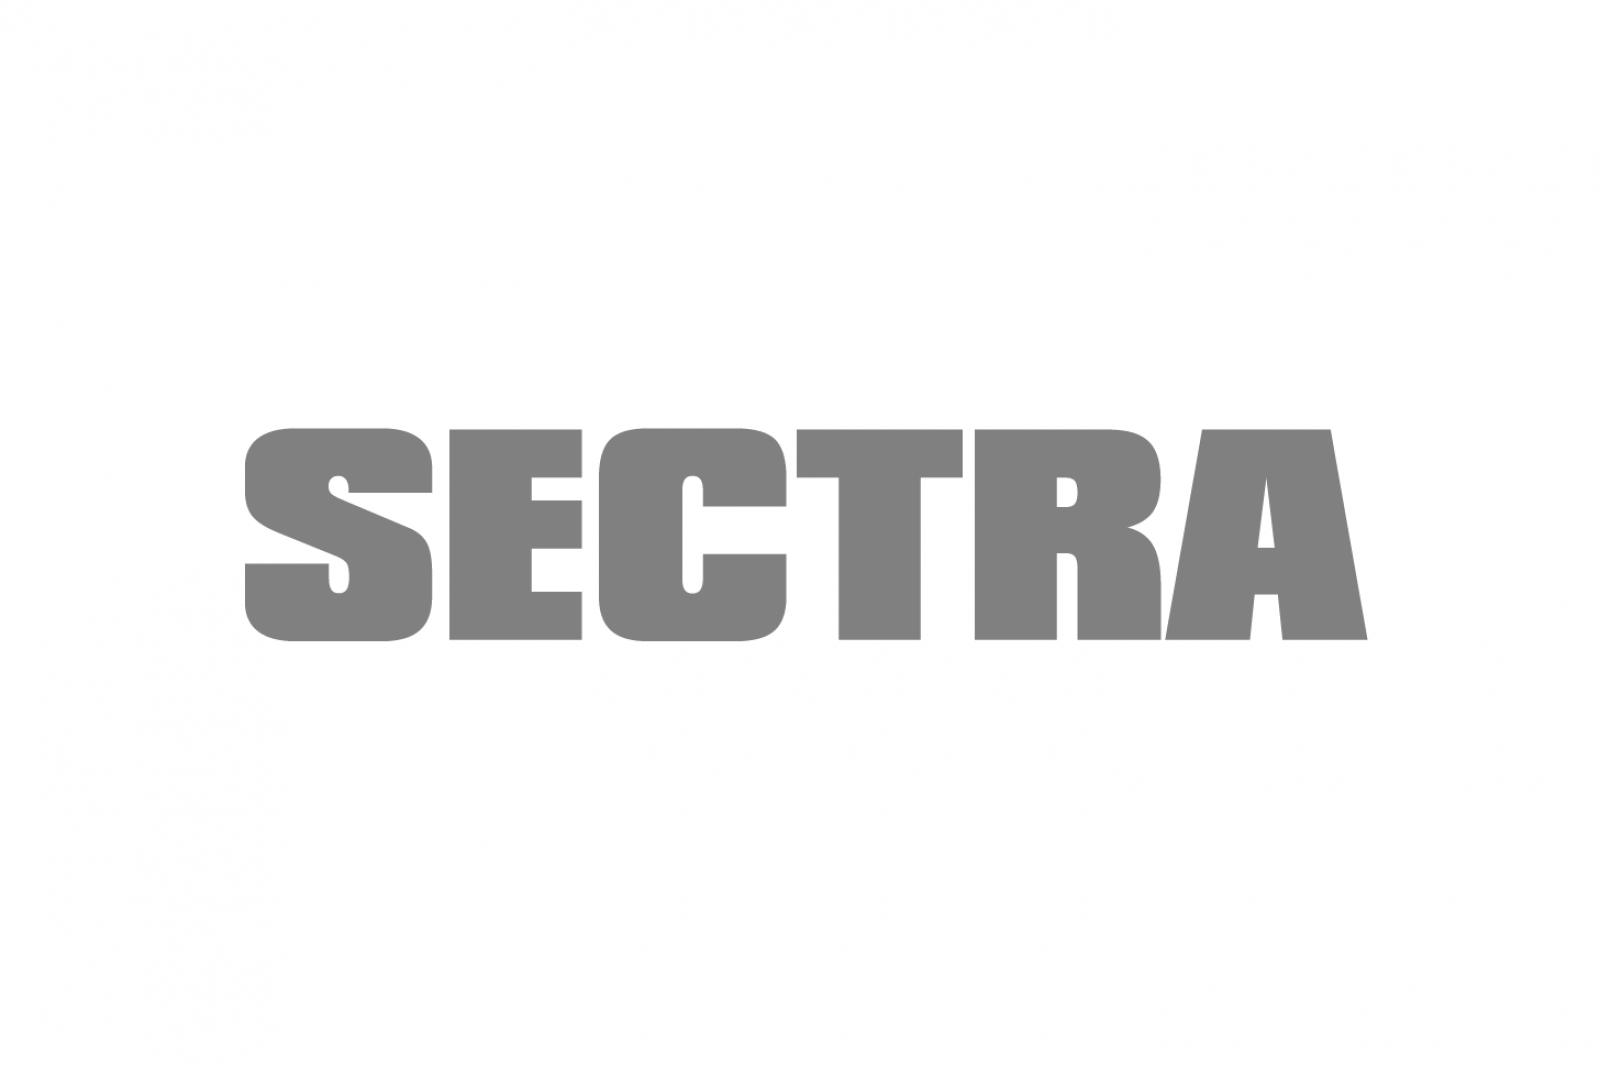 Sectra sponsor